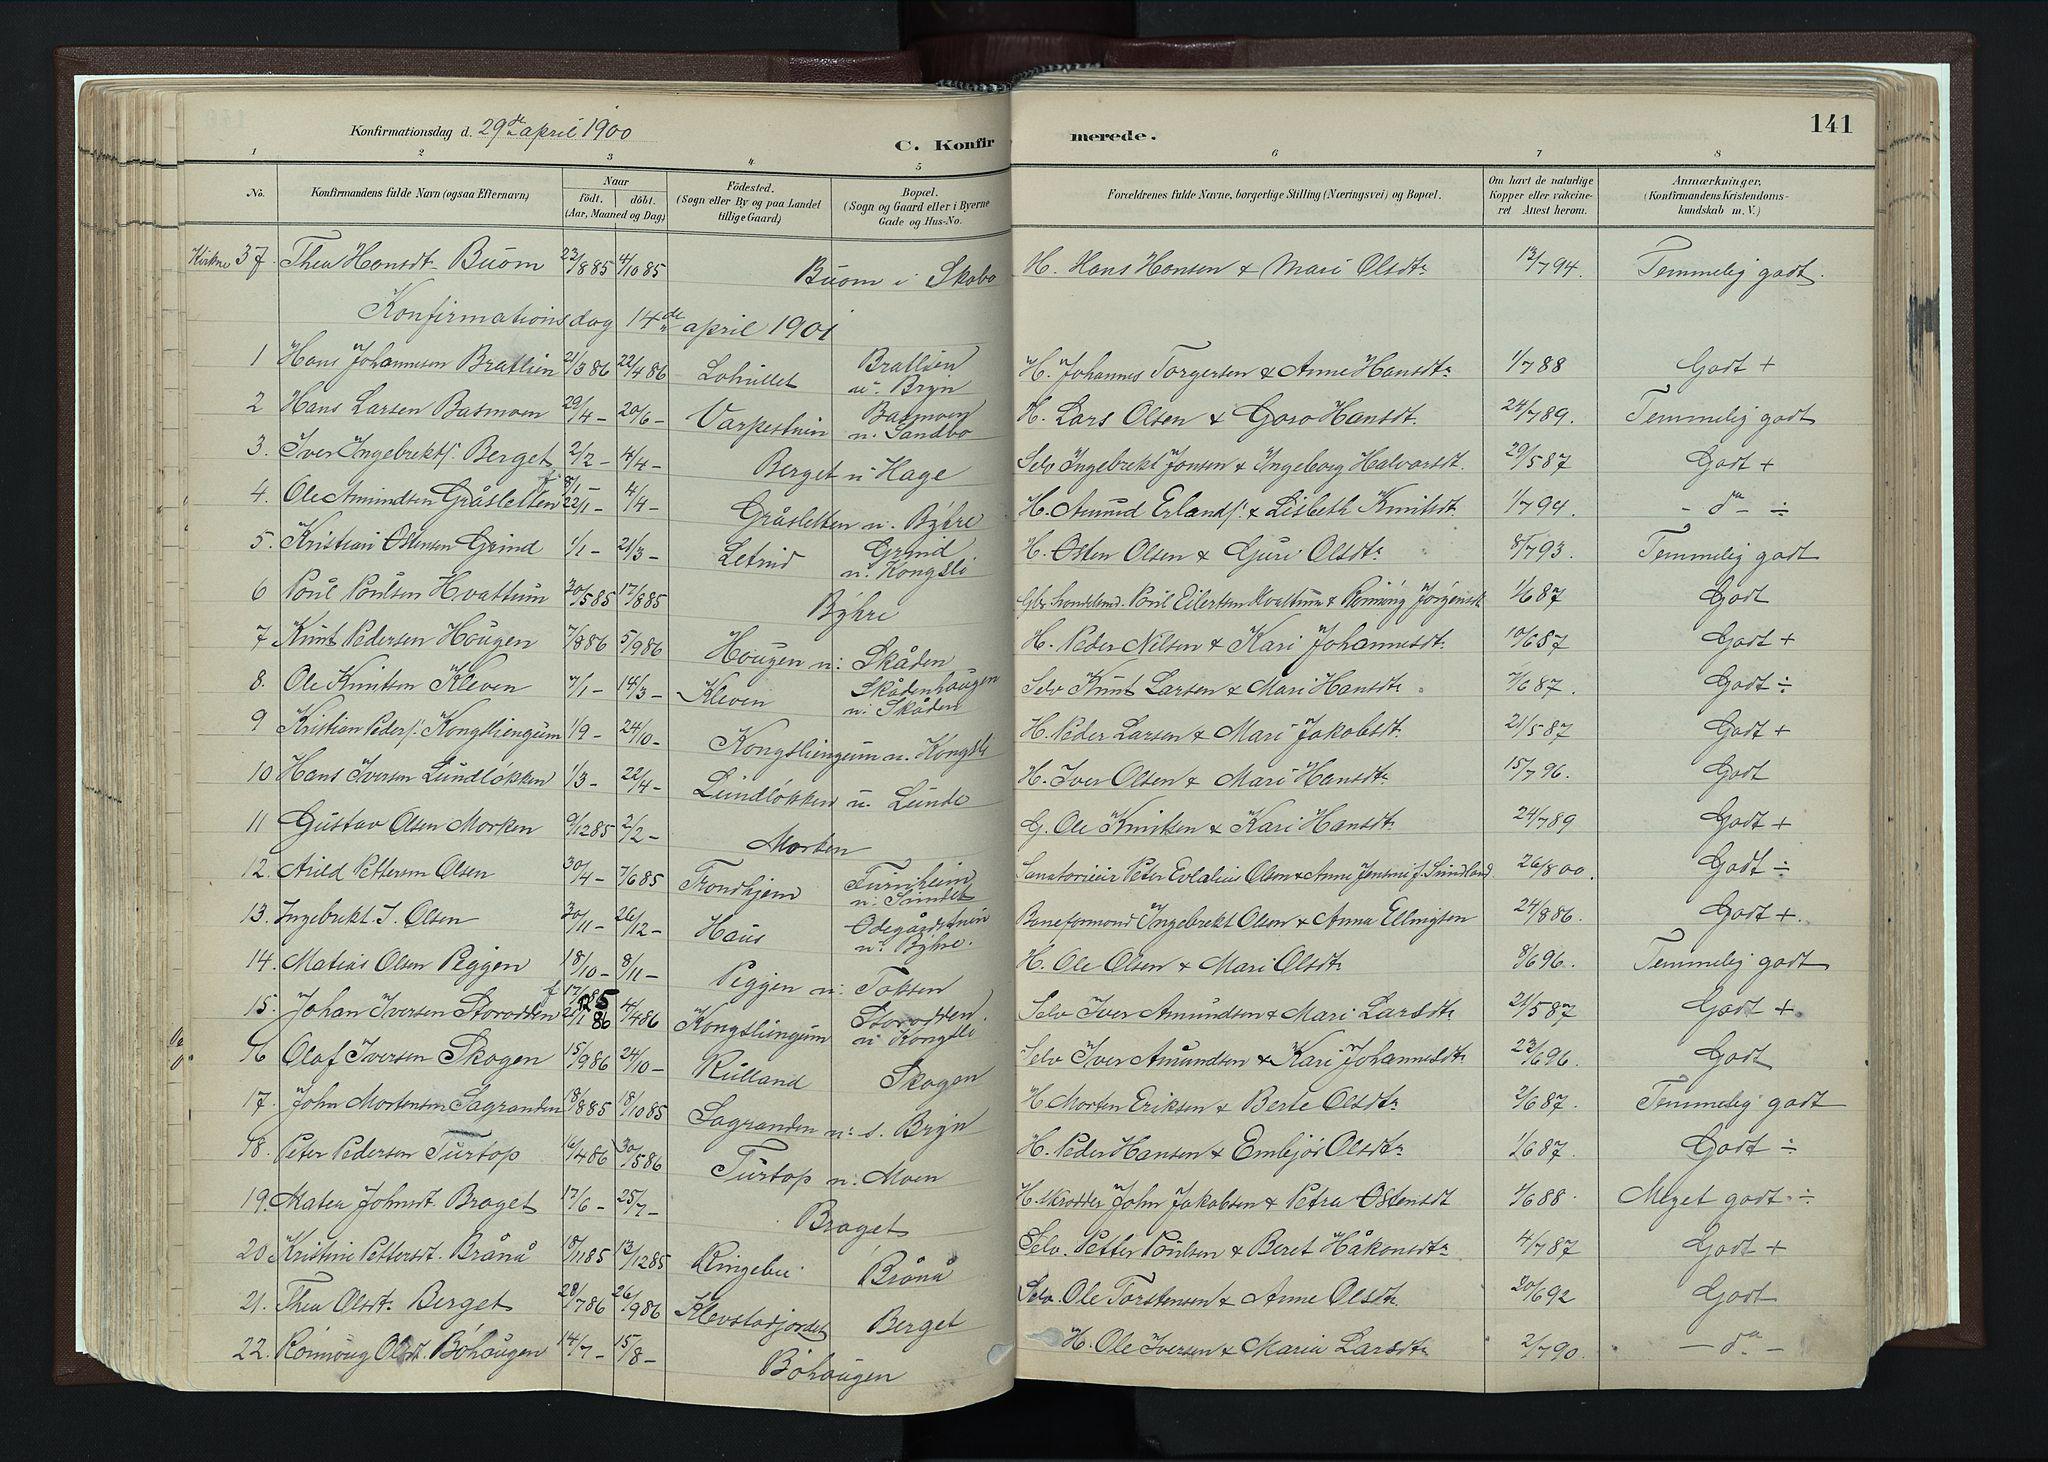 SAH, Nord-Fron prestekontor, Ministerialbok nr. 4, 1884-1914, s. 141